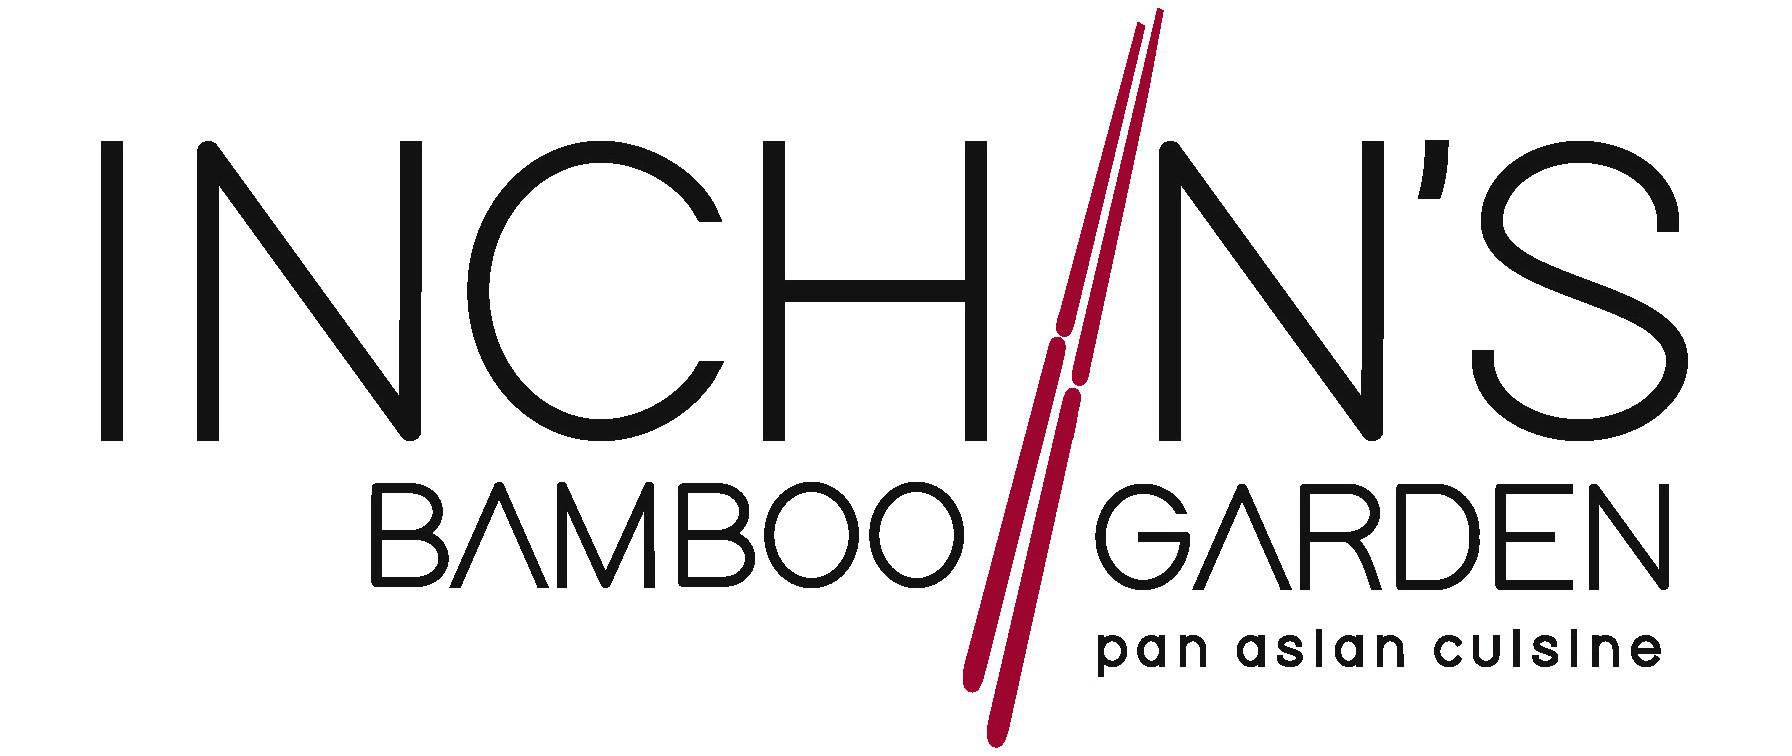 Bamboo Inchins